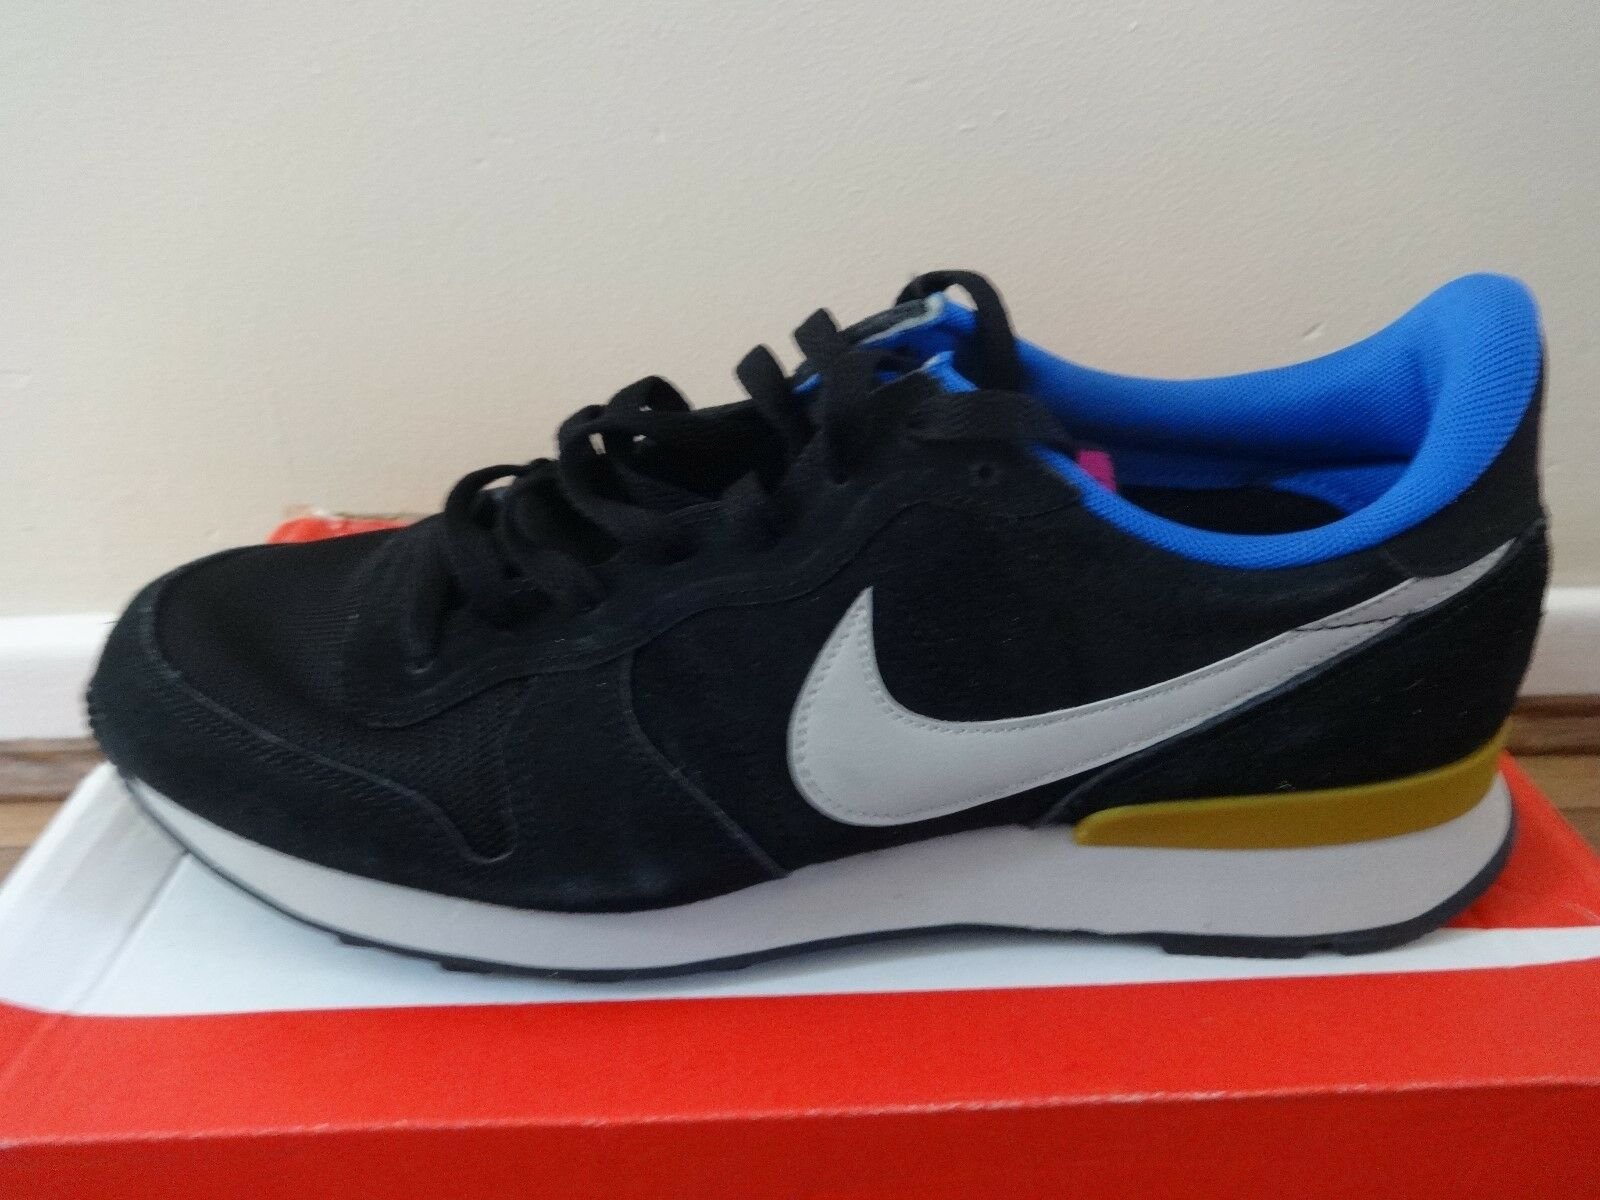 Nike Internationalist Suede trainers 631755 003 uk 6 eu 40 us 7 NEW IN BOX